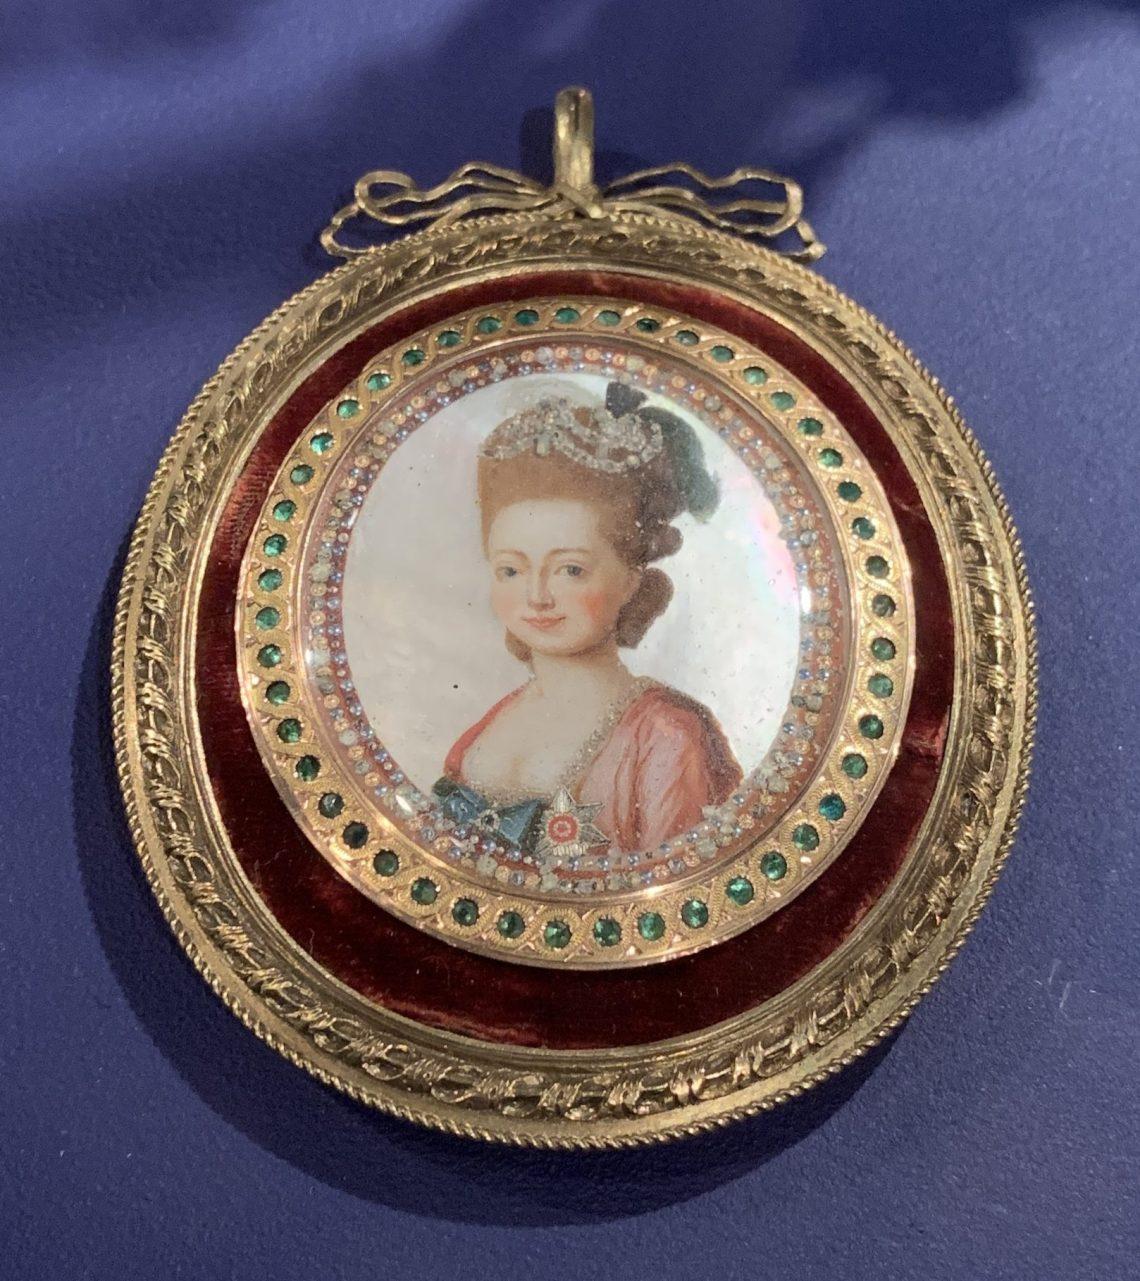 Juwelen! Hermitage Amsterdam, 2019. Medaillon met portret van Maria Fjodorovna, circa 1782. Foto met dank aan SAF, Astrid Berens©